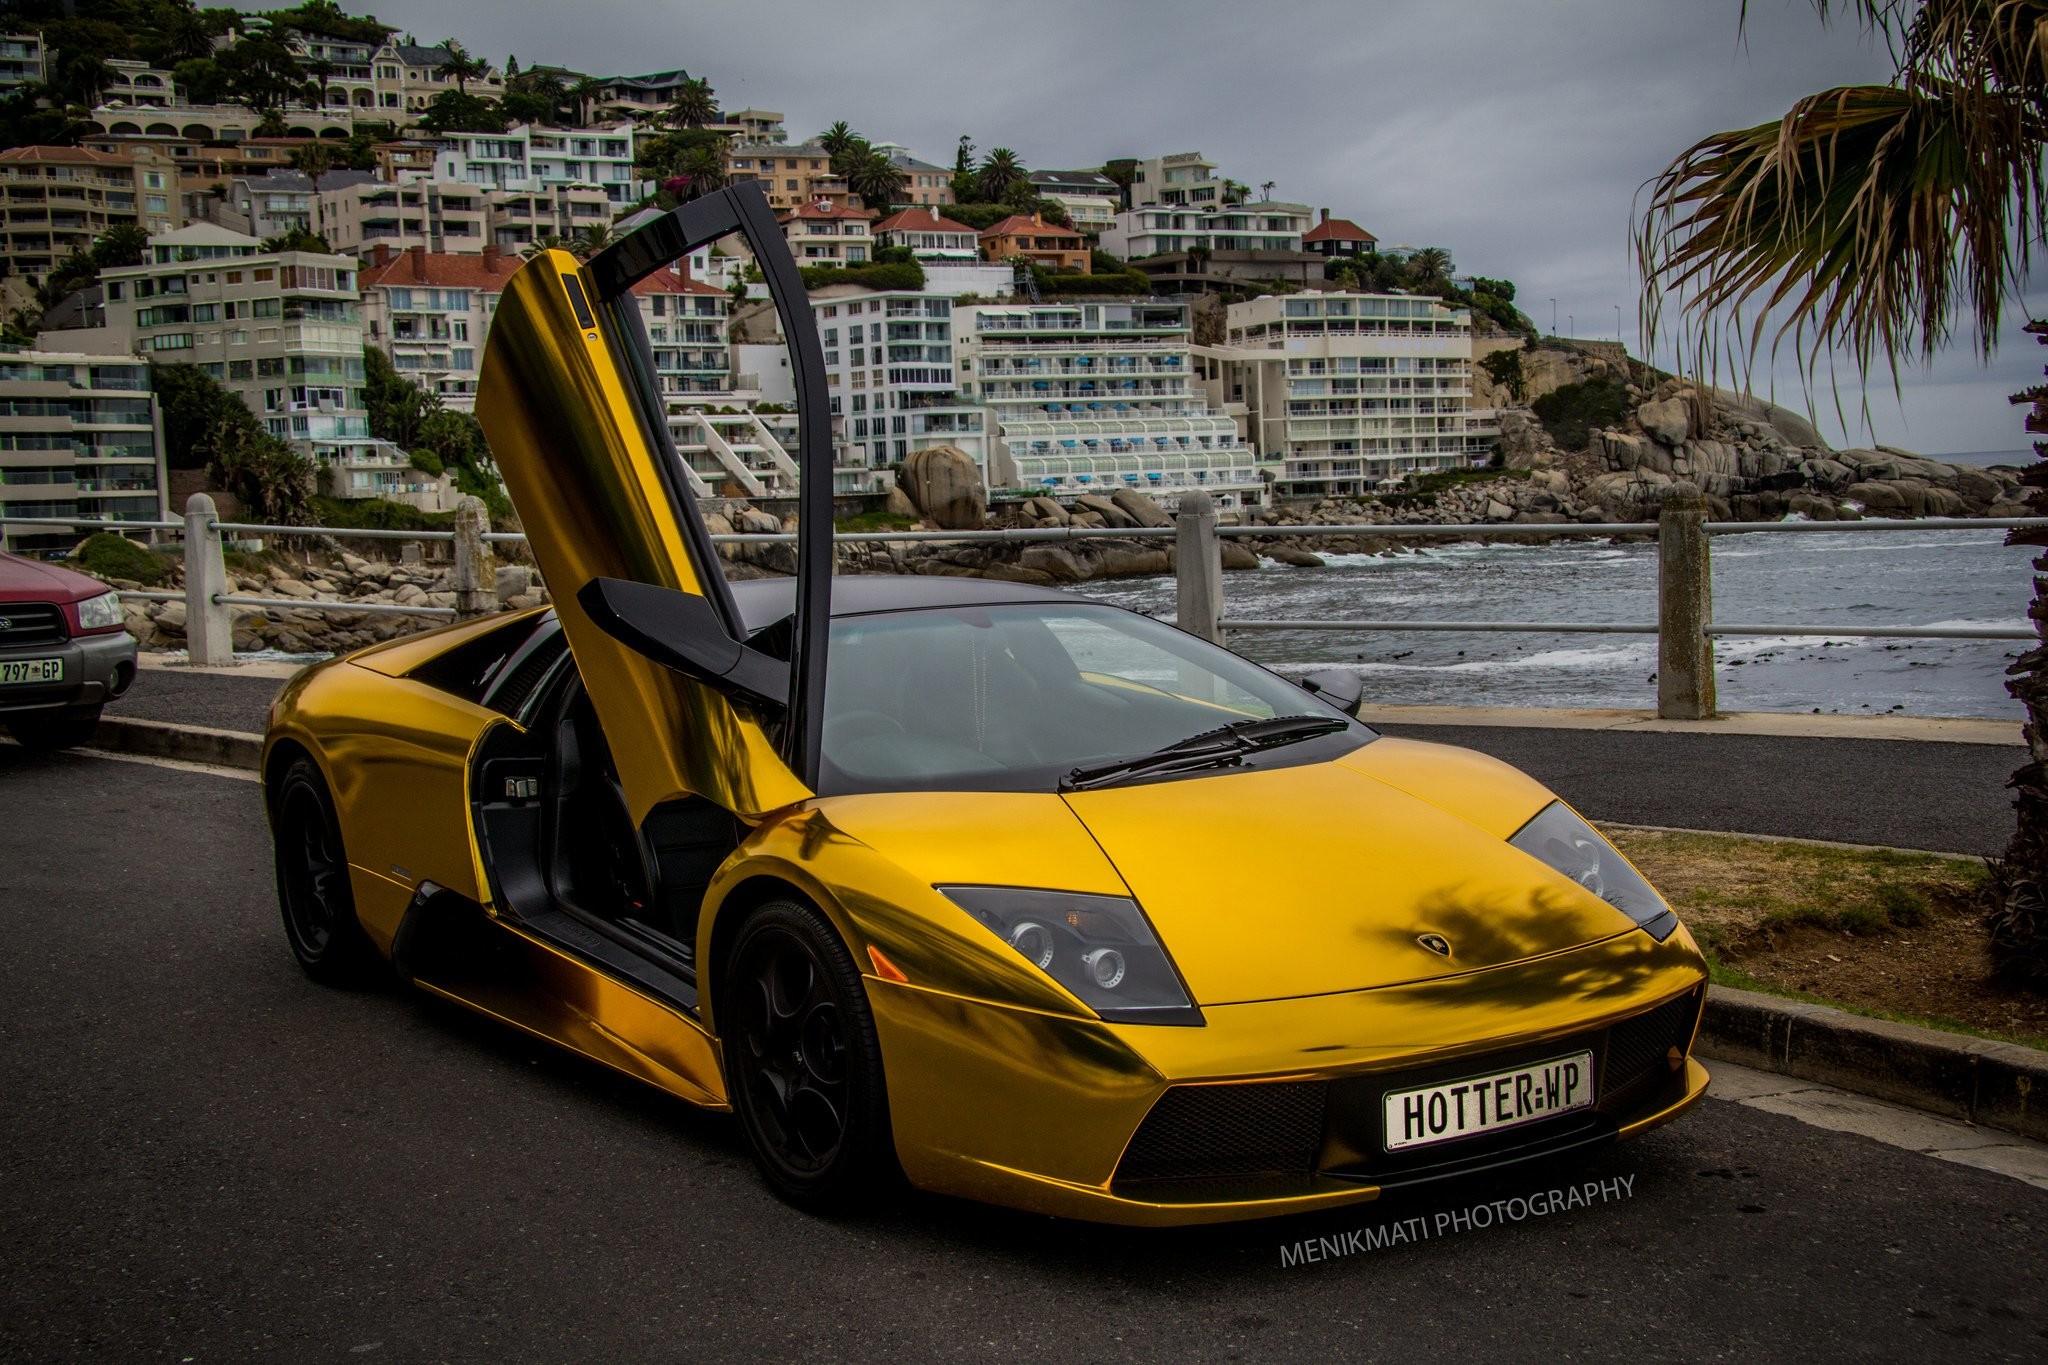 1920x1080 ... Cool Gold Cars Wallpapers Wallpapersafari; Awesome Cool  Lamborghini .